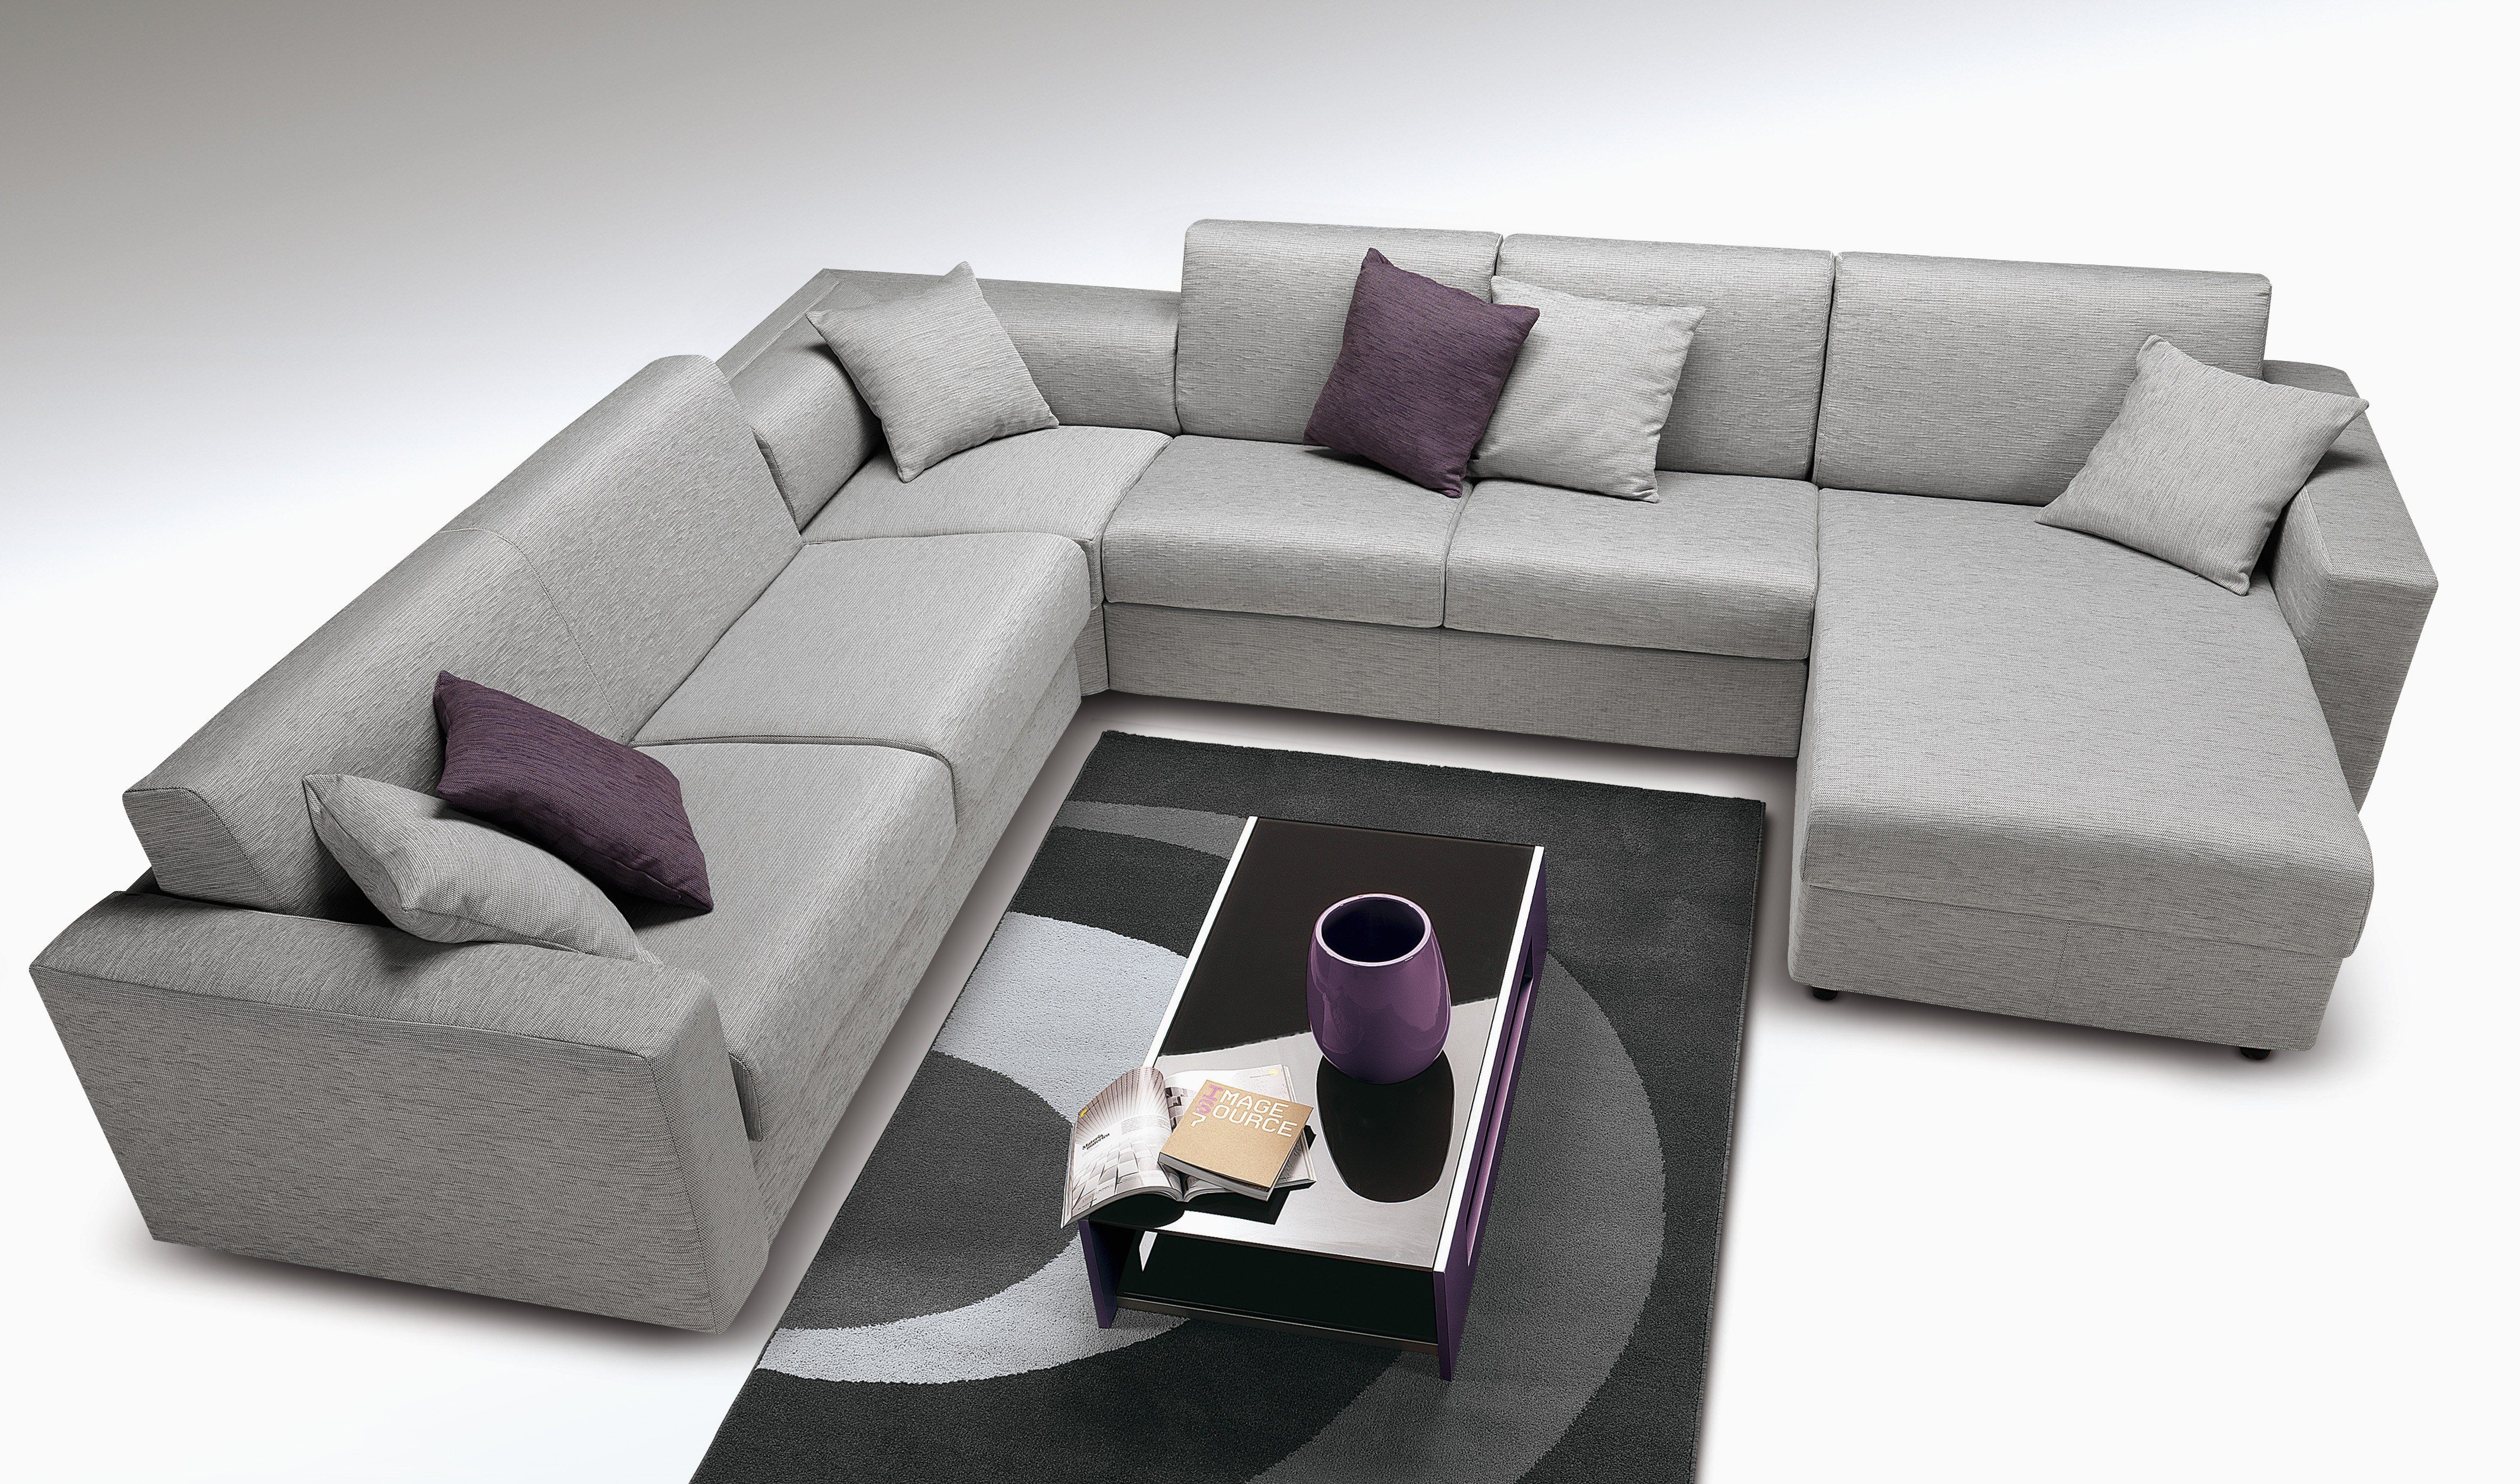 Ikea Canapé Lit Convertible Génial Canapé Ikea Convertible 45 Meilleures Petit Canape Cuir 2 Places